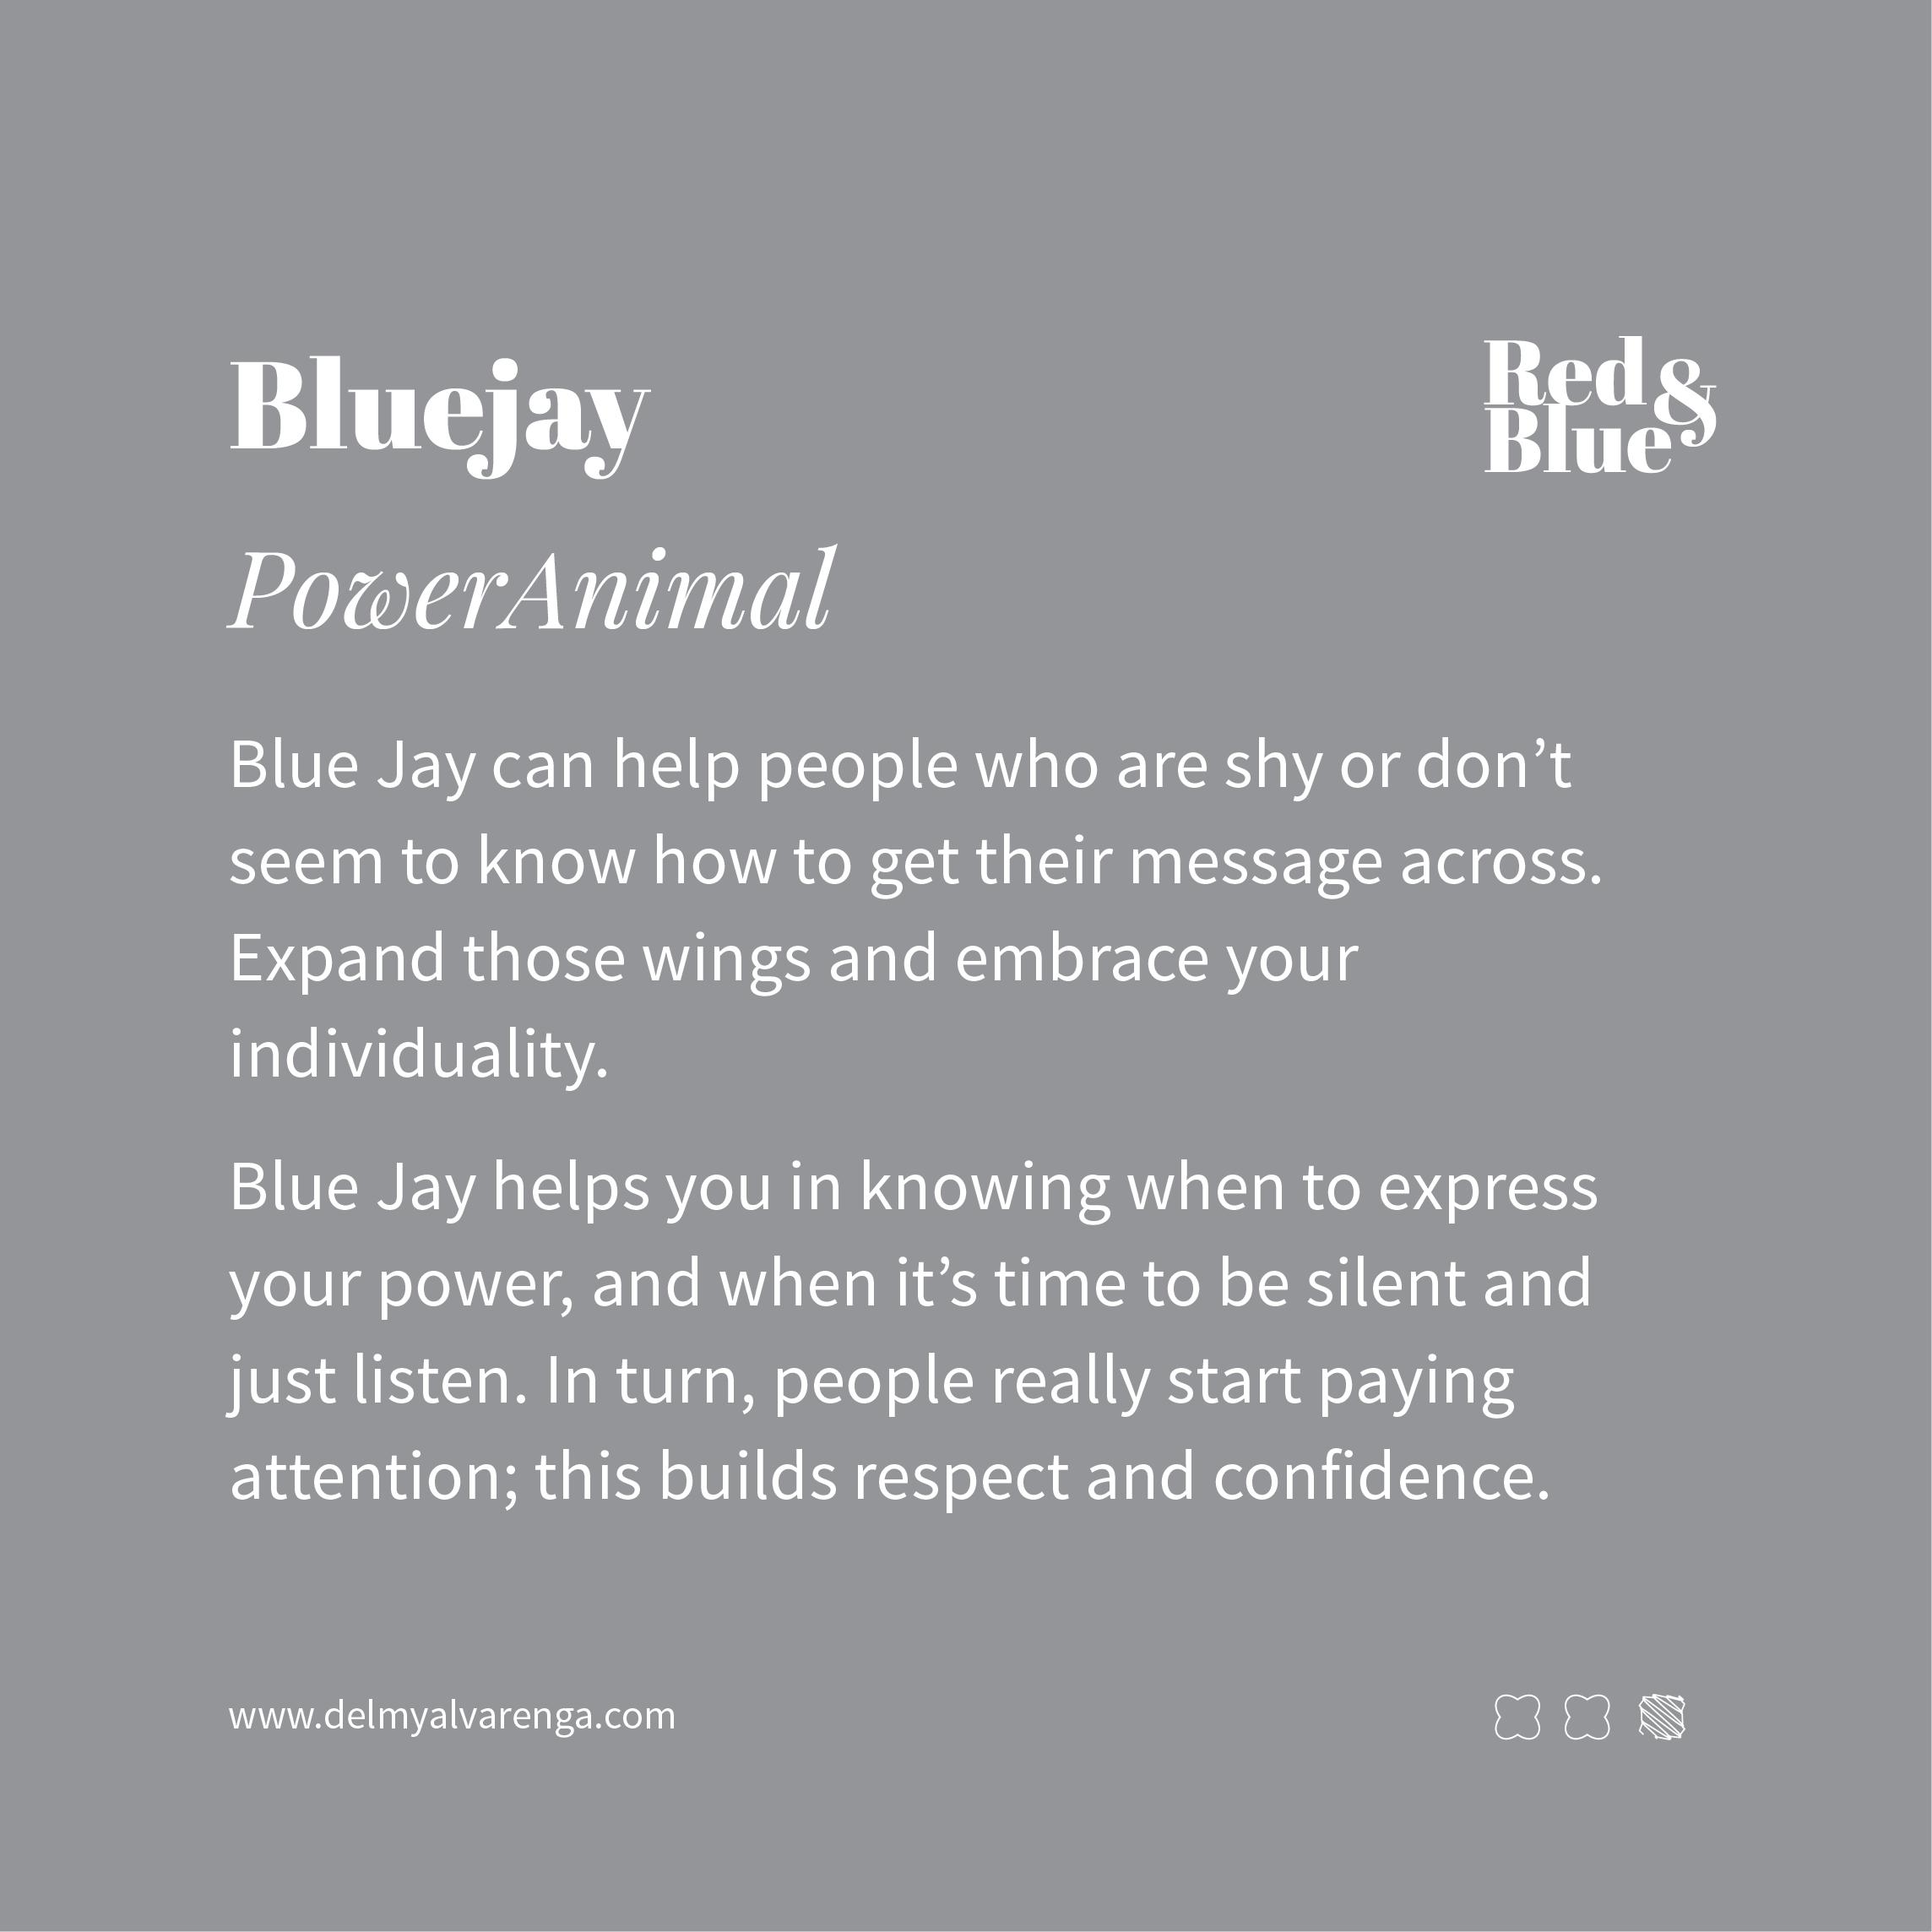 Blue Jay Power Animal